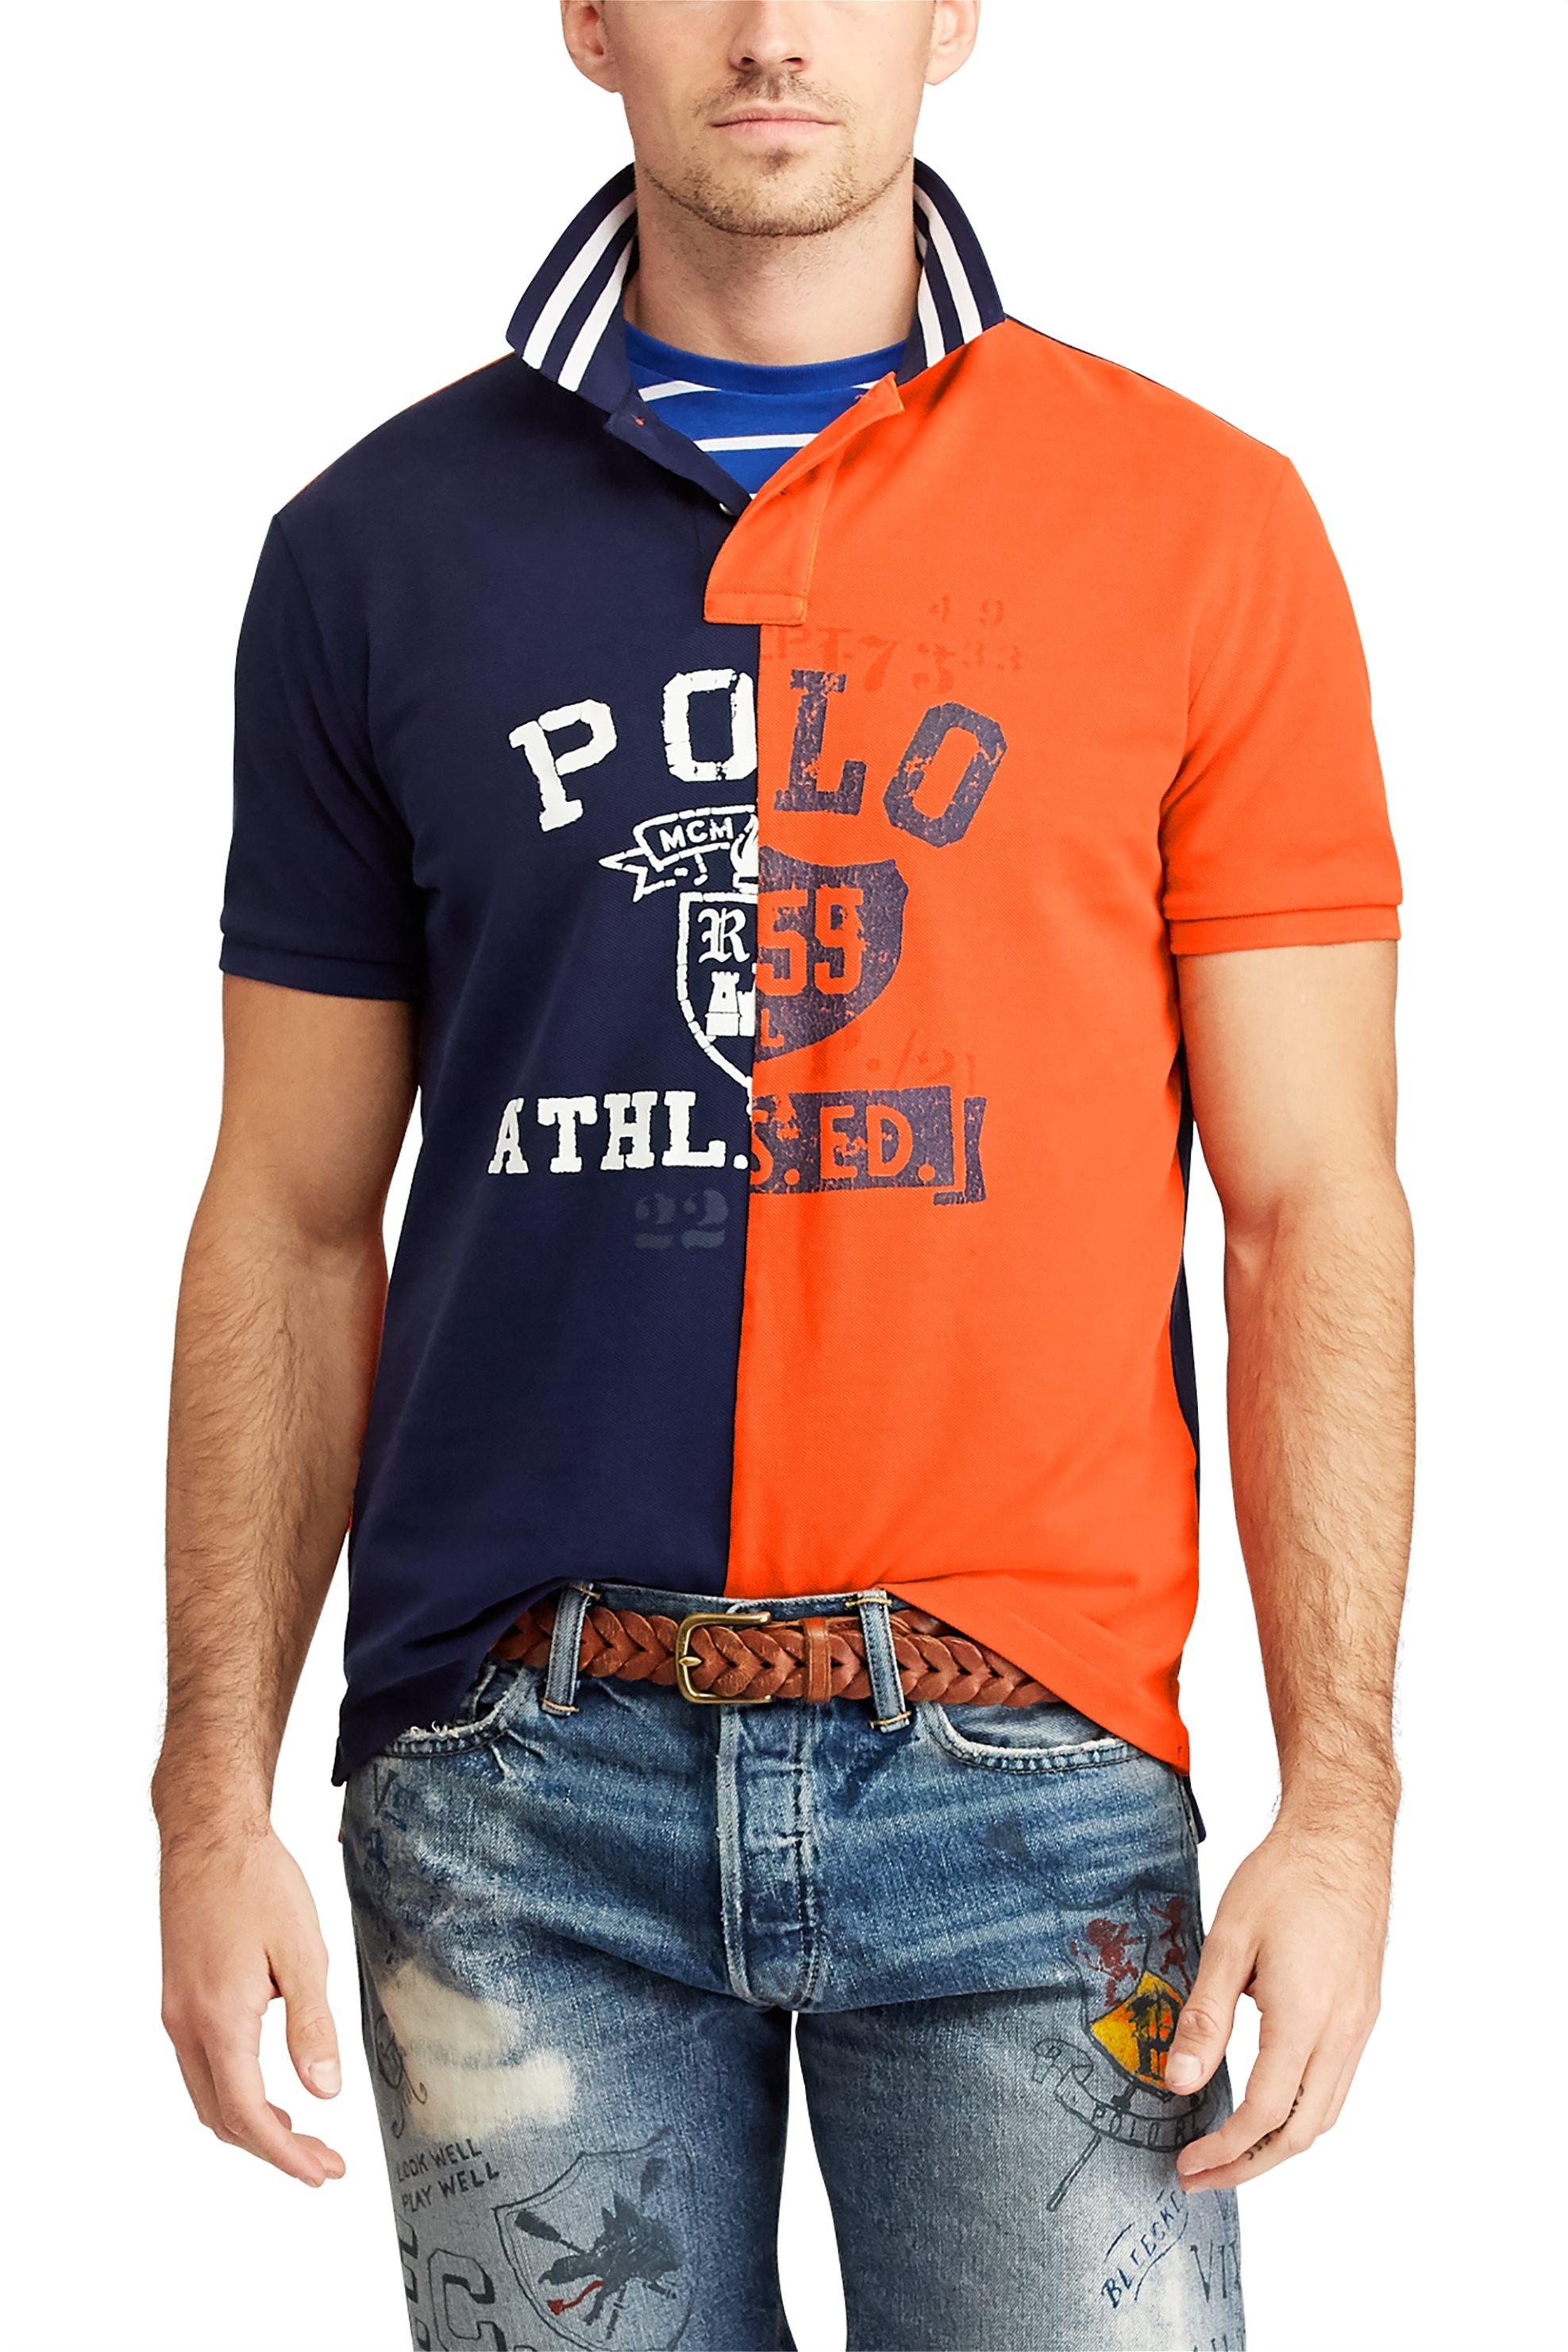 120740bea825 Polo Ralph Lauren ανδρική μπλούζα πόλο με στάμπα